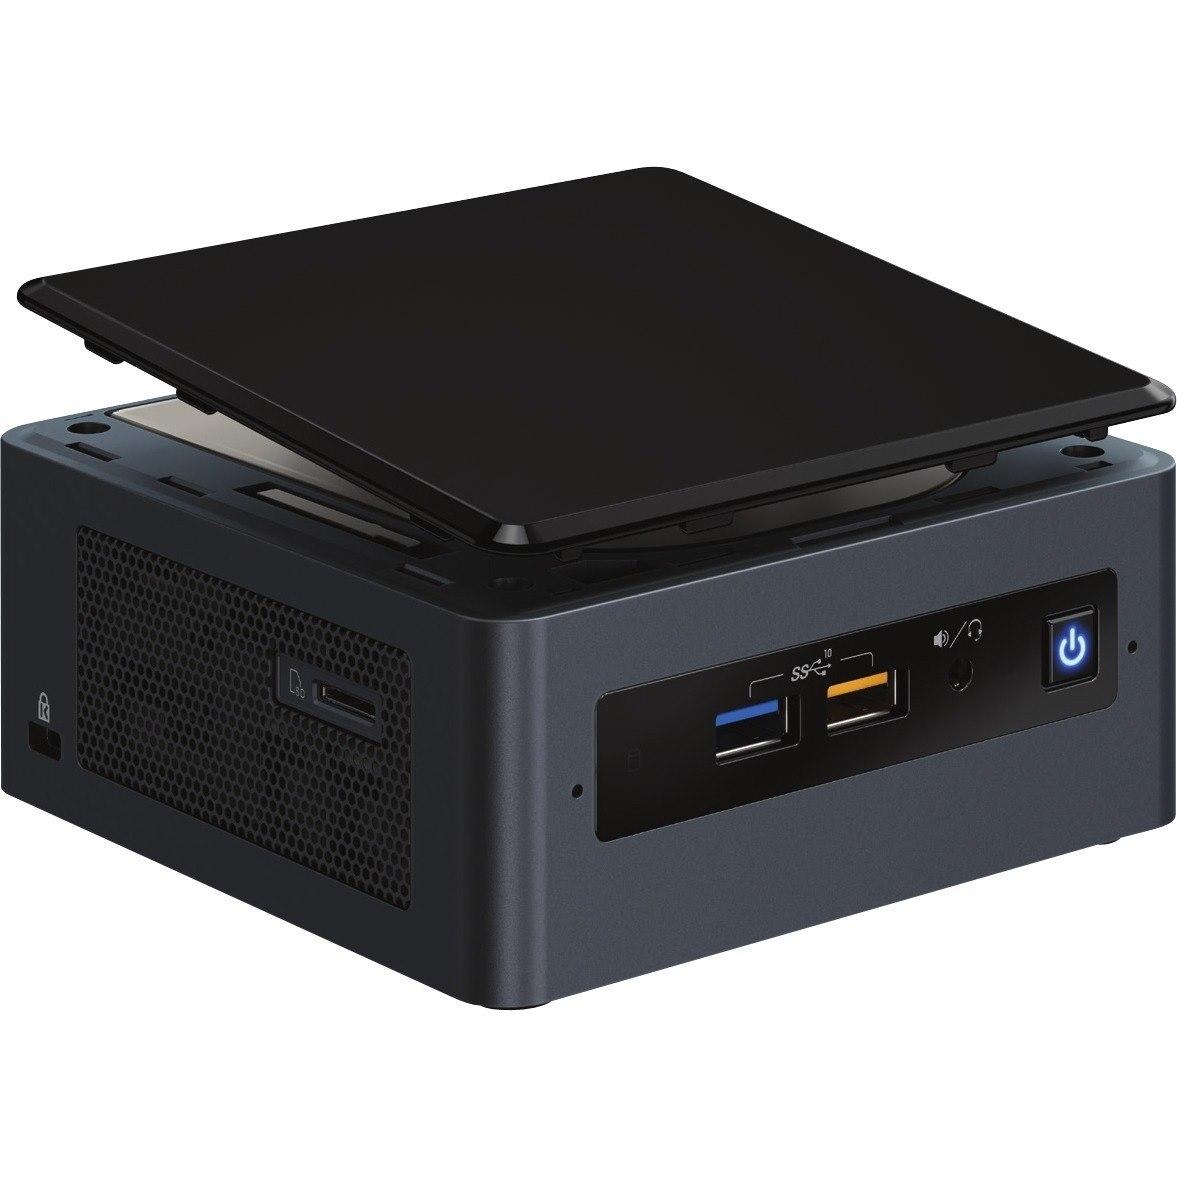 Intel NUC NUC8i5BEH Desktop Computer - Intel Core i5 8th Gen i5-8259U 2.30 GHz DDR4 SDRAM - Mini PC